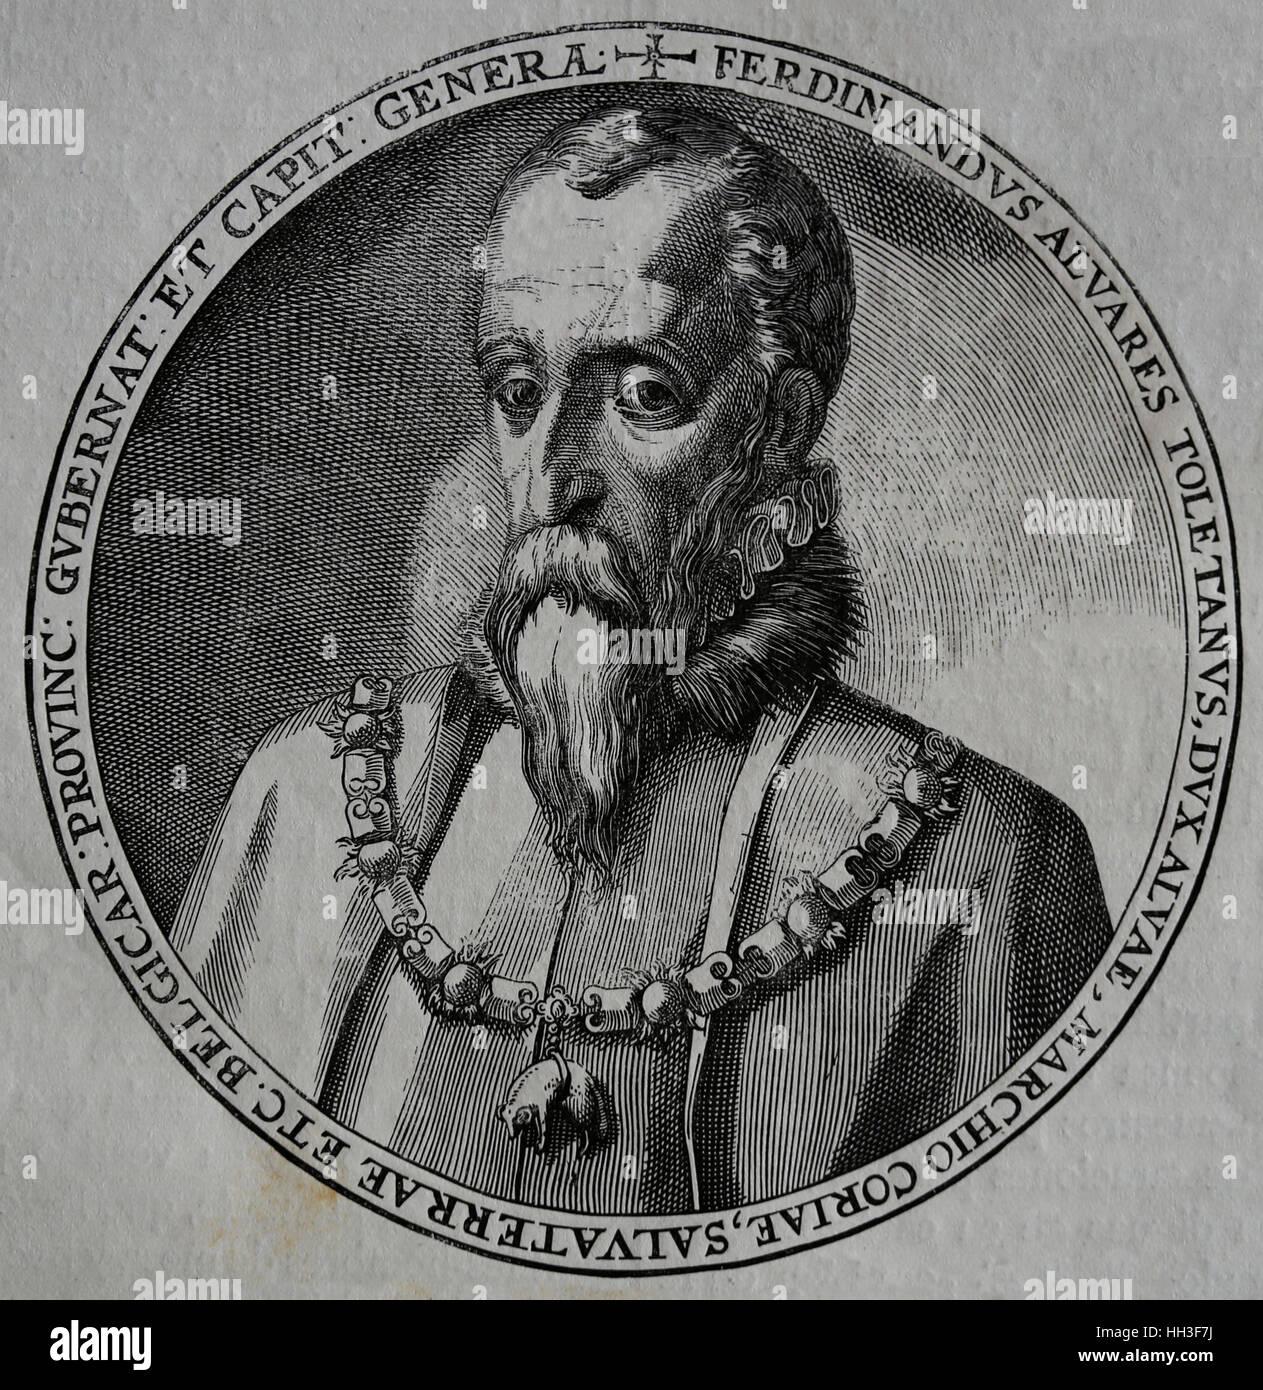 Fernando Alvarez de Toledo, 3rd Duke of Alba (1507-1582). Governor of Milan, Viceroy of Naples and Gobernor of Netherlands. - Stock Image